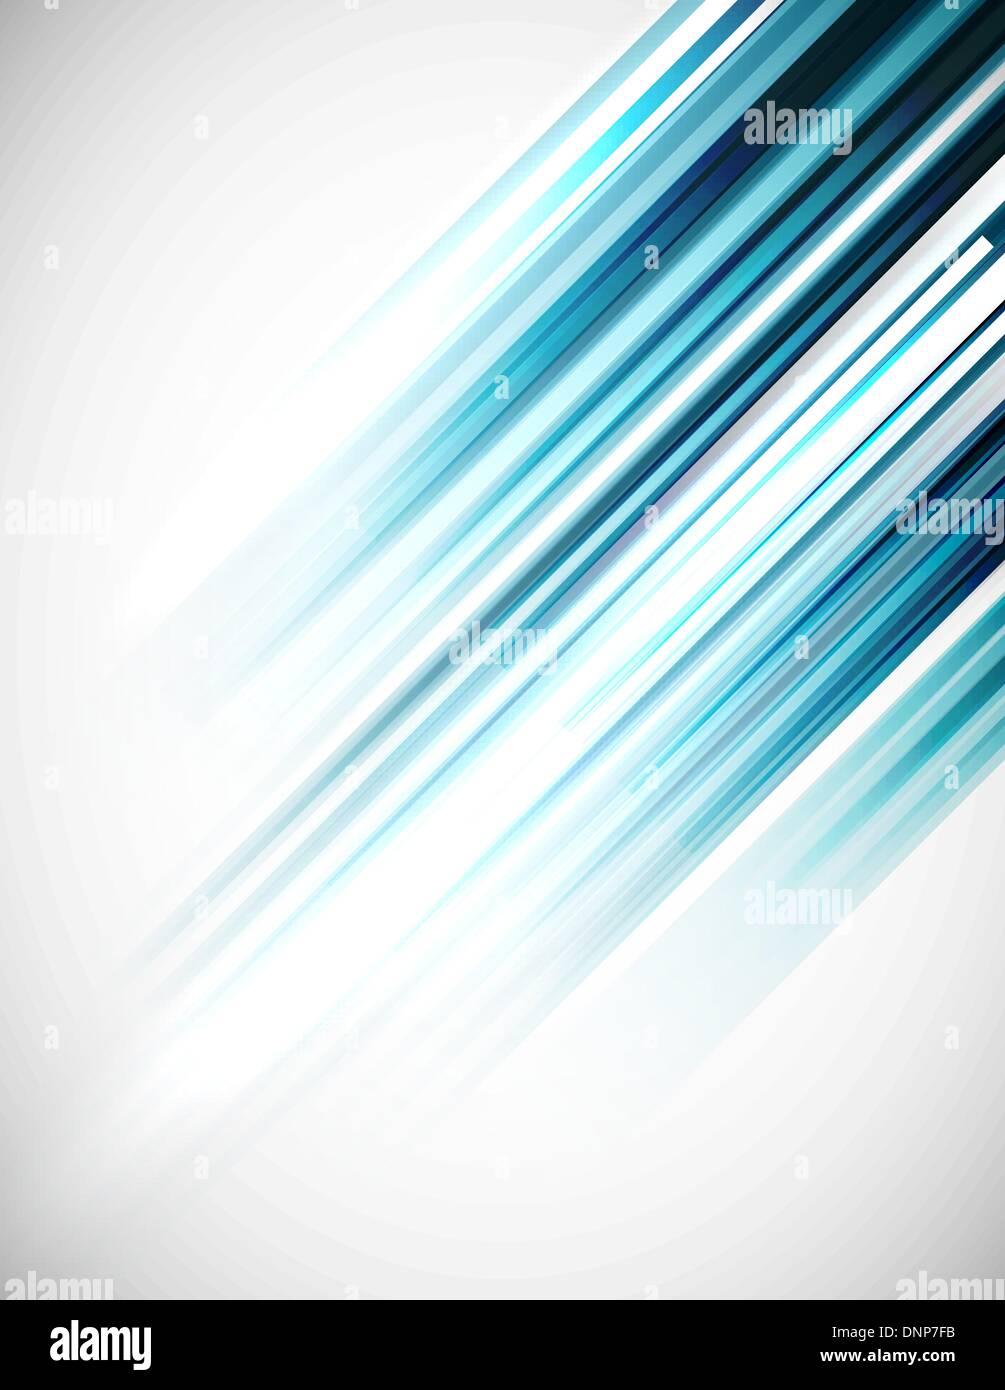 Blue abstract straight lines vector background Stock-Vektorgrafik